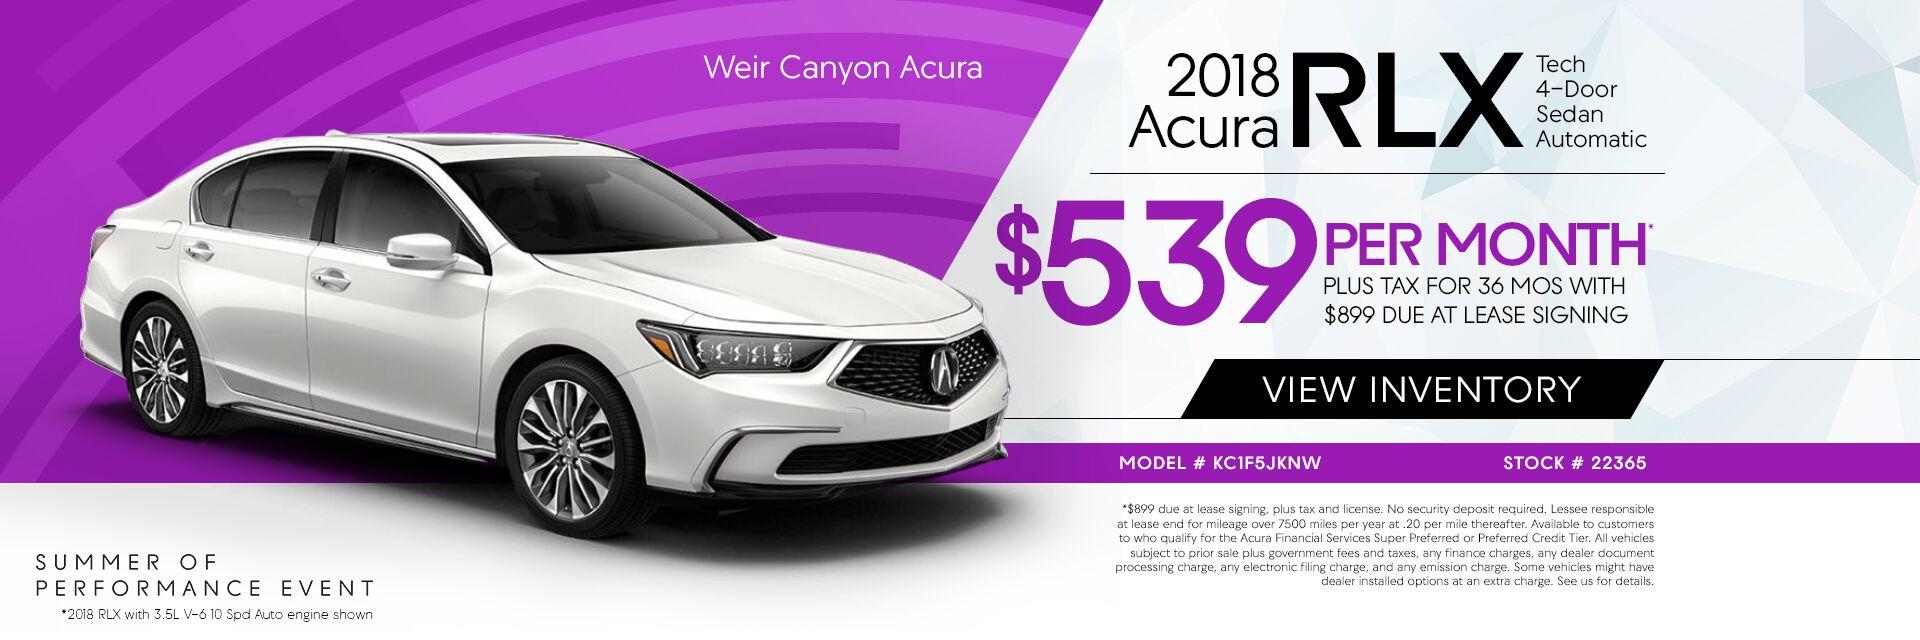 Acura Dealership Anaheim, Newport Coast, and Orange County CA | Used on